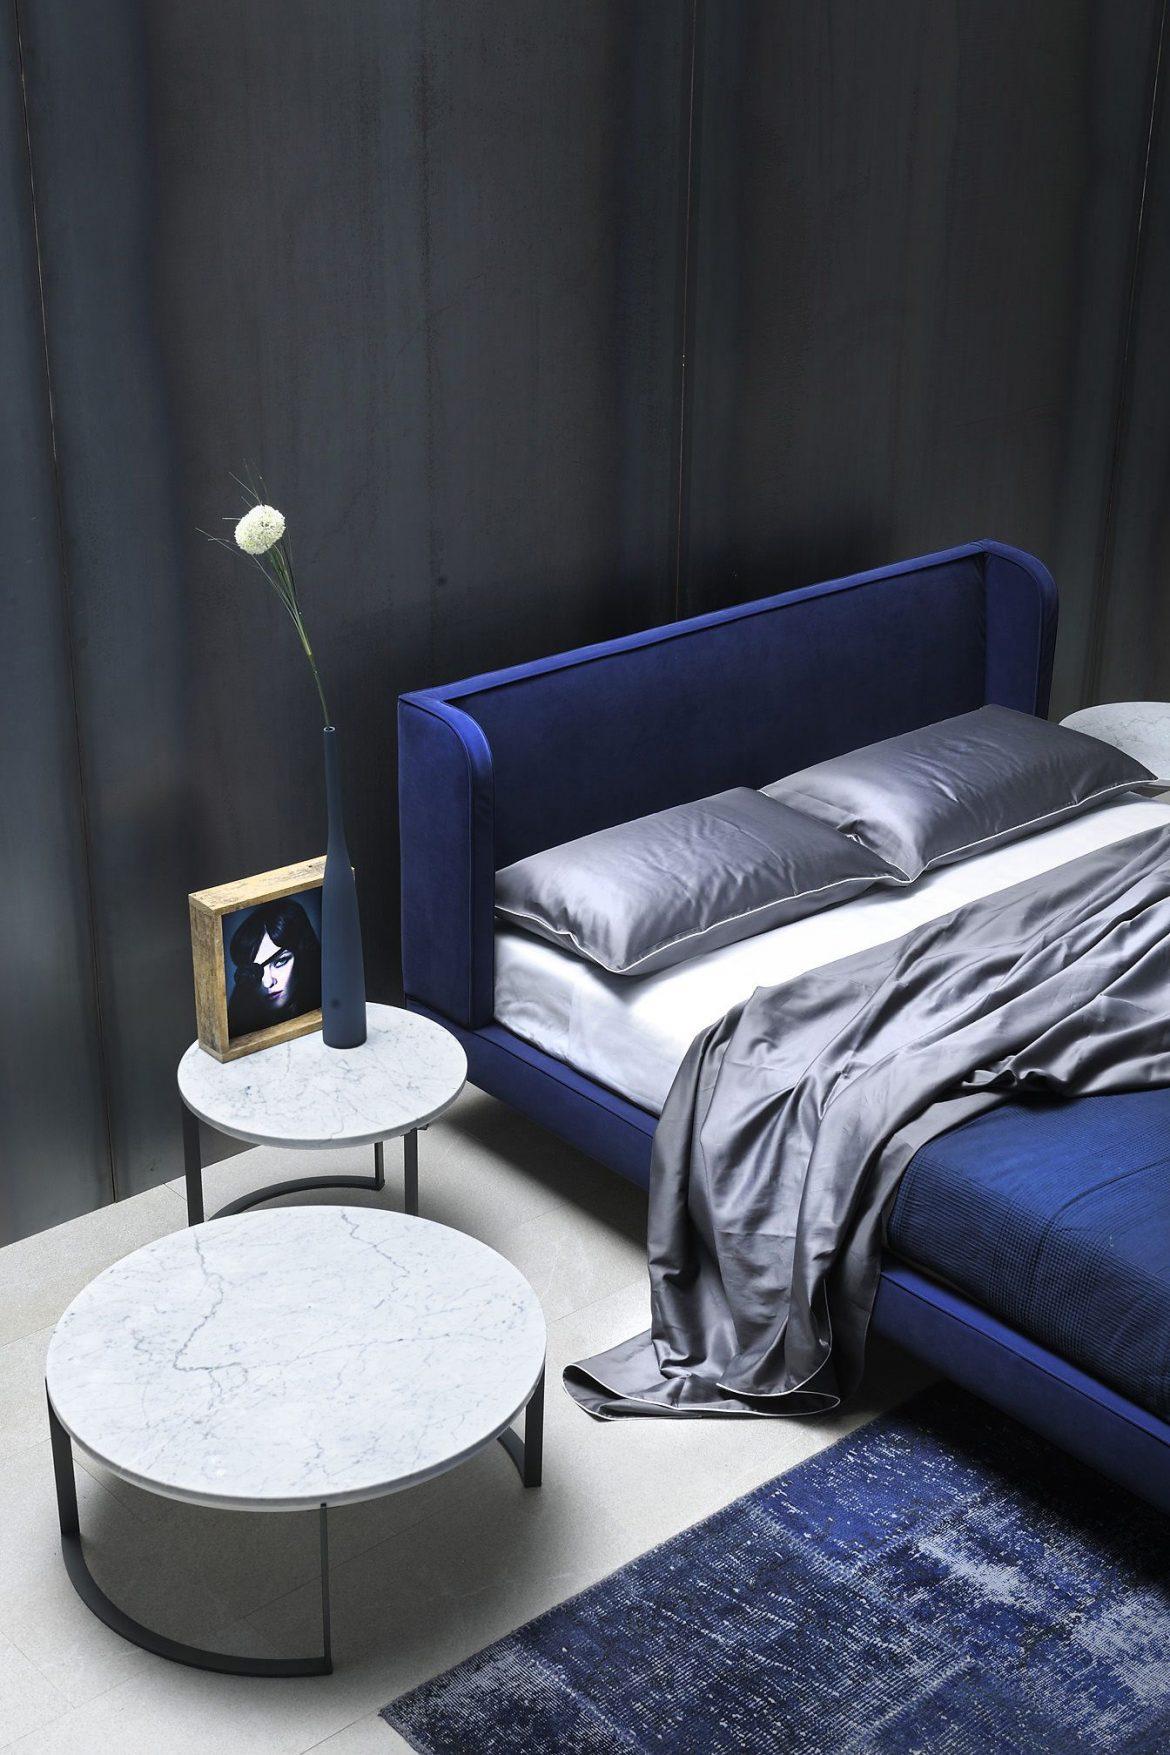 10 Stunning Bedroom Ideas For Winter bedroom ideas 10 Stunning Bedroom Ideas For Winter pinterest 3 1